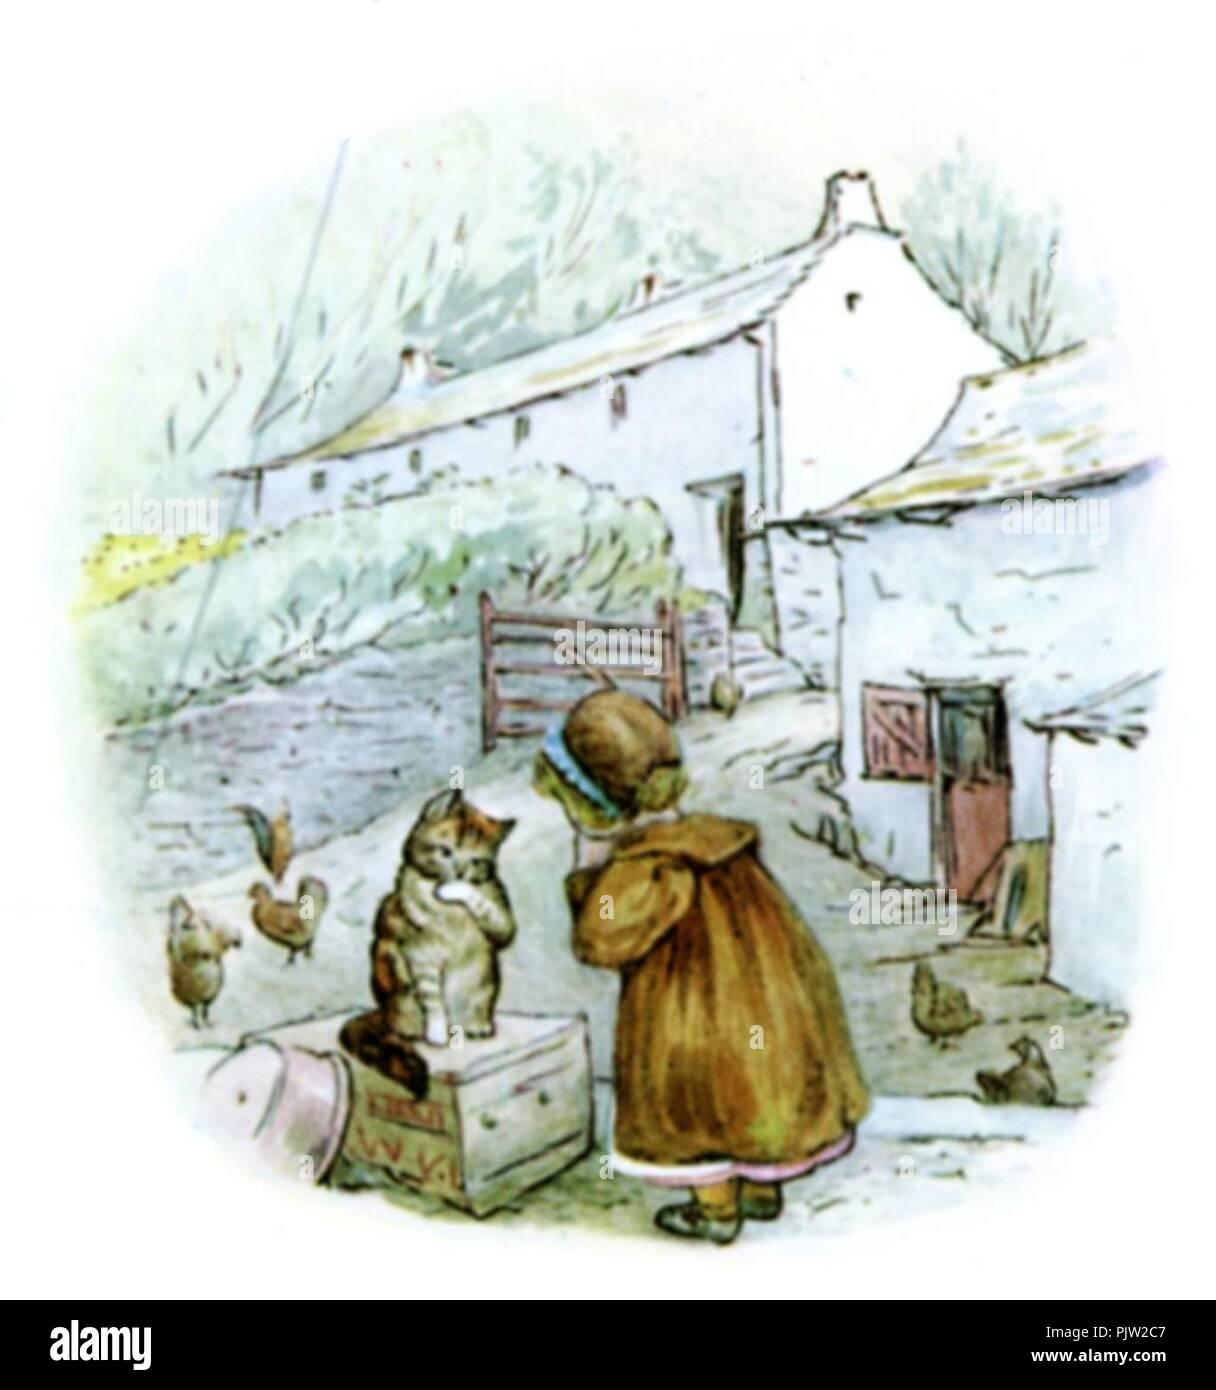 Beatrix Potter, Mrs Tiggy-Winkle, Little-Town. - Stock Image